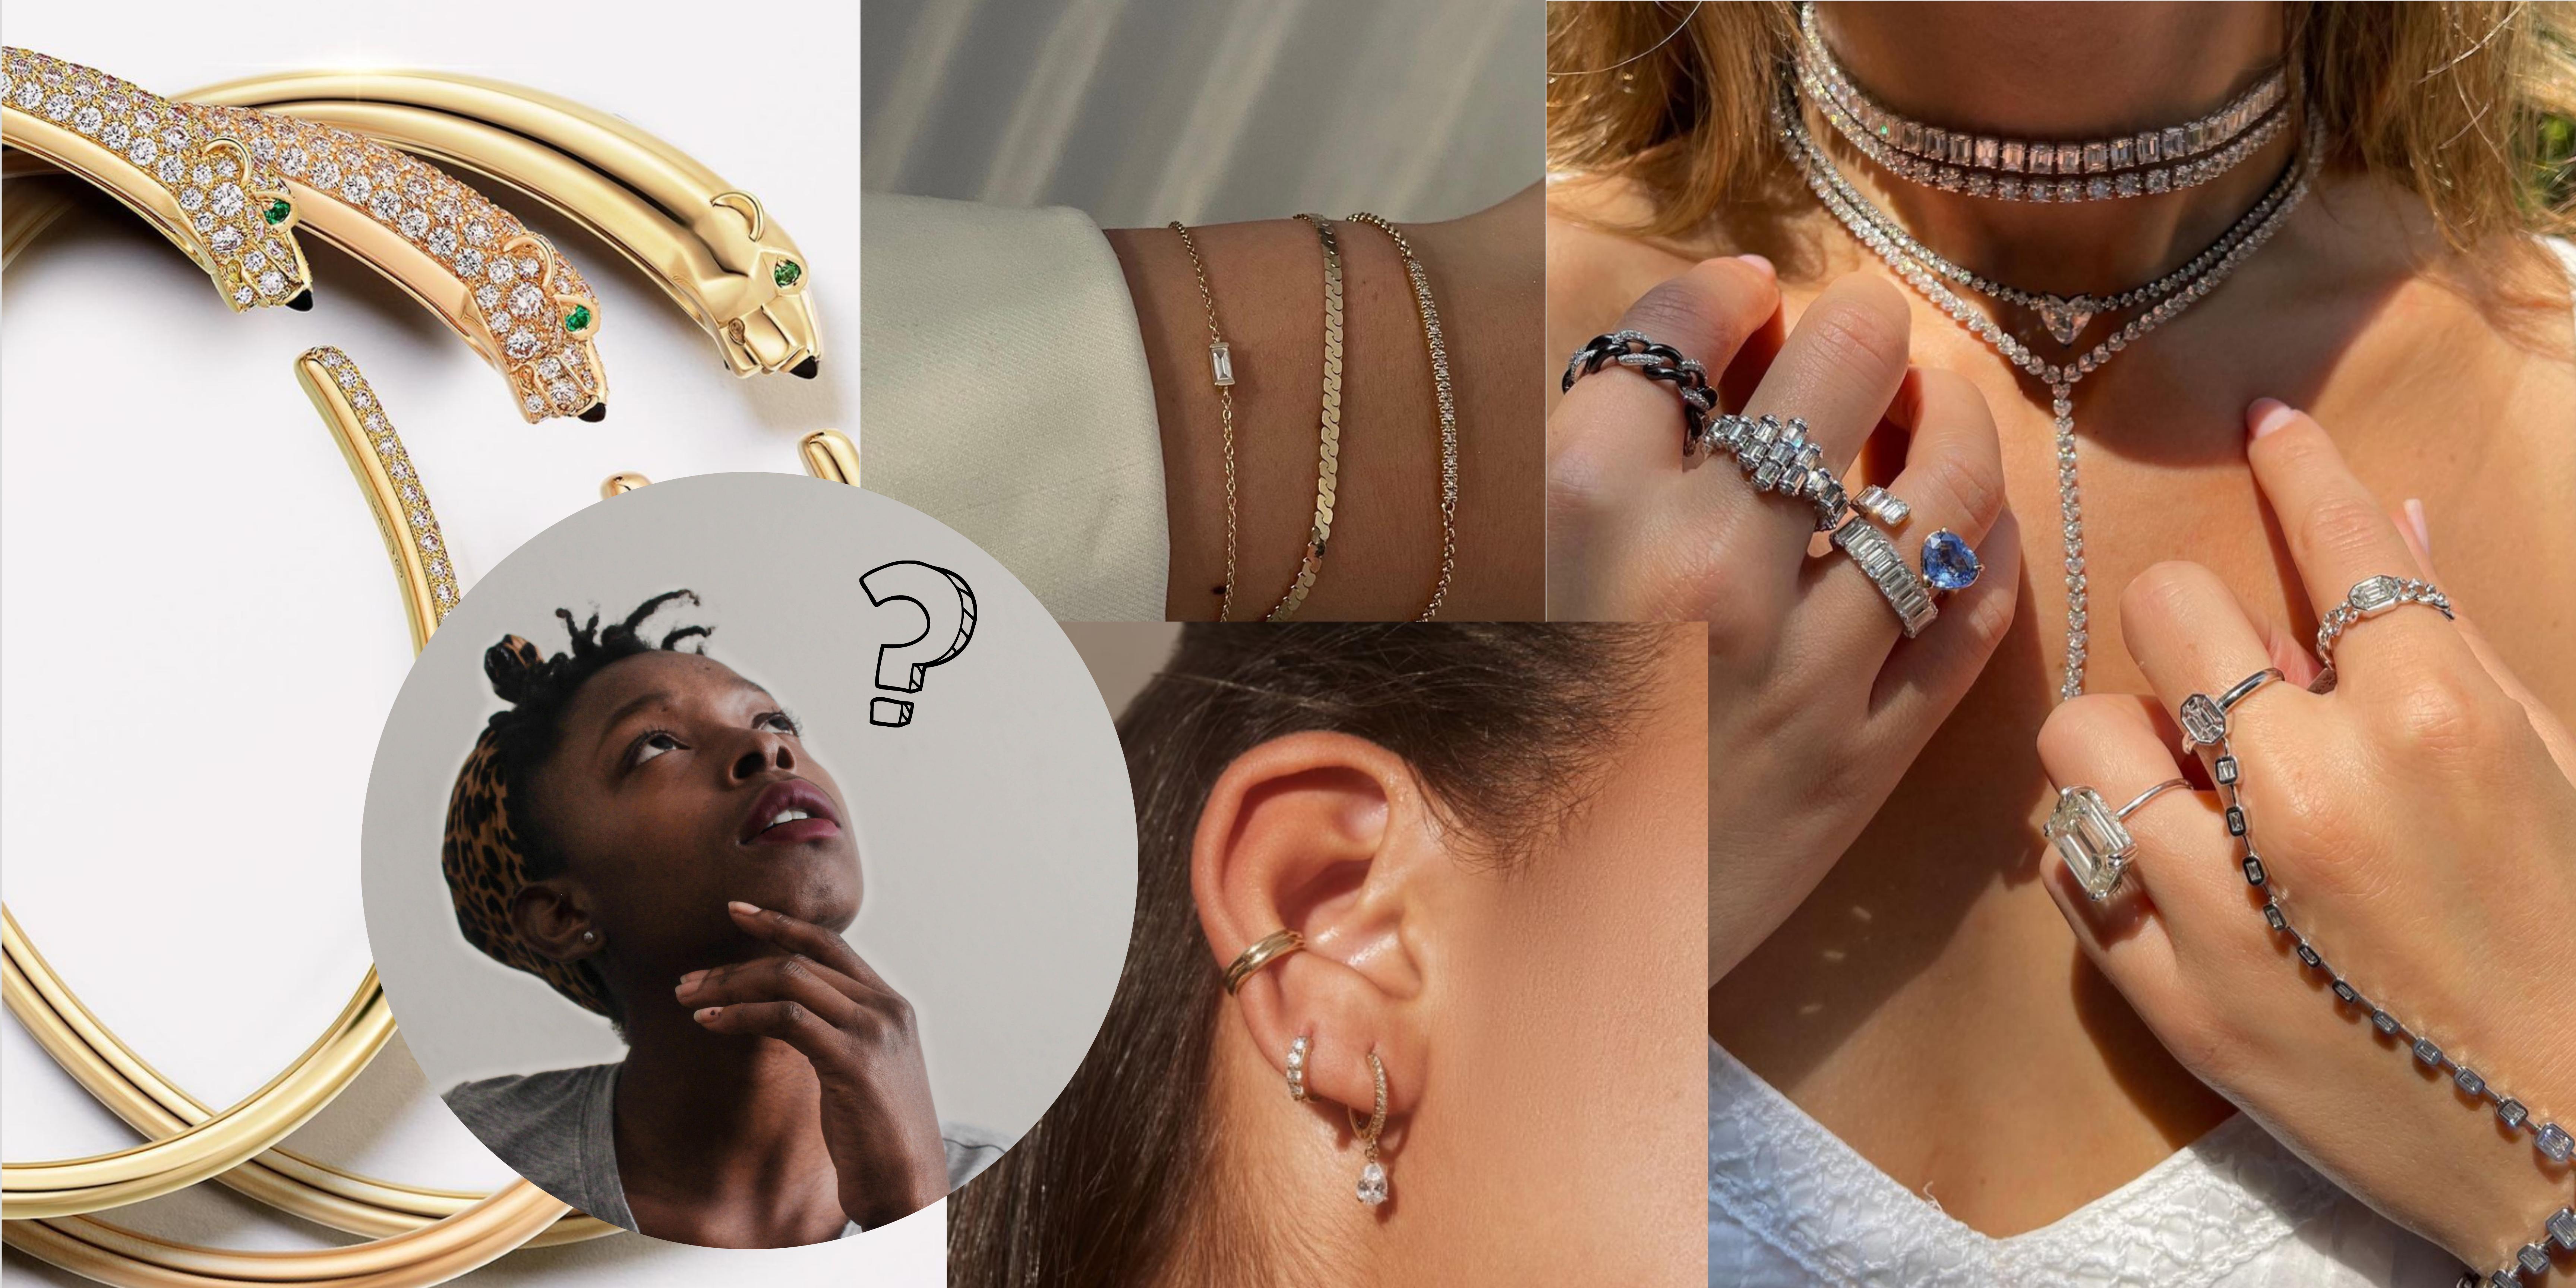 Fun Jewelry vs Investment Jewelry